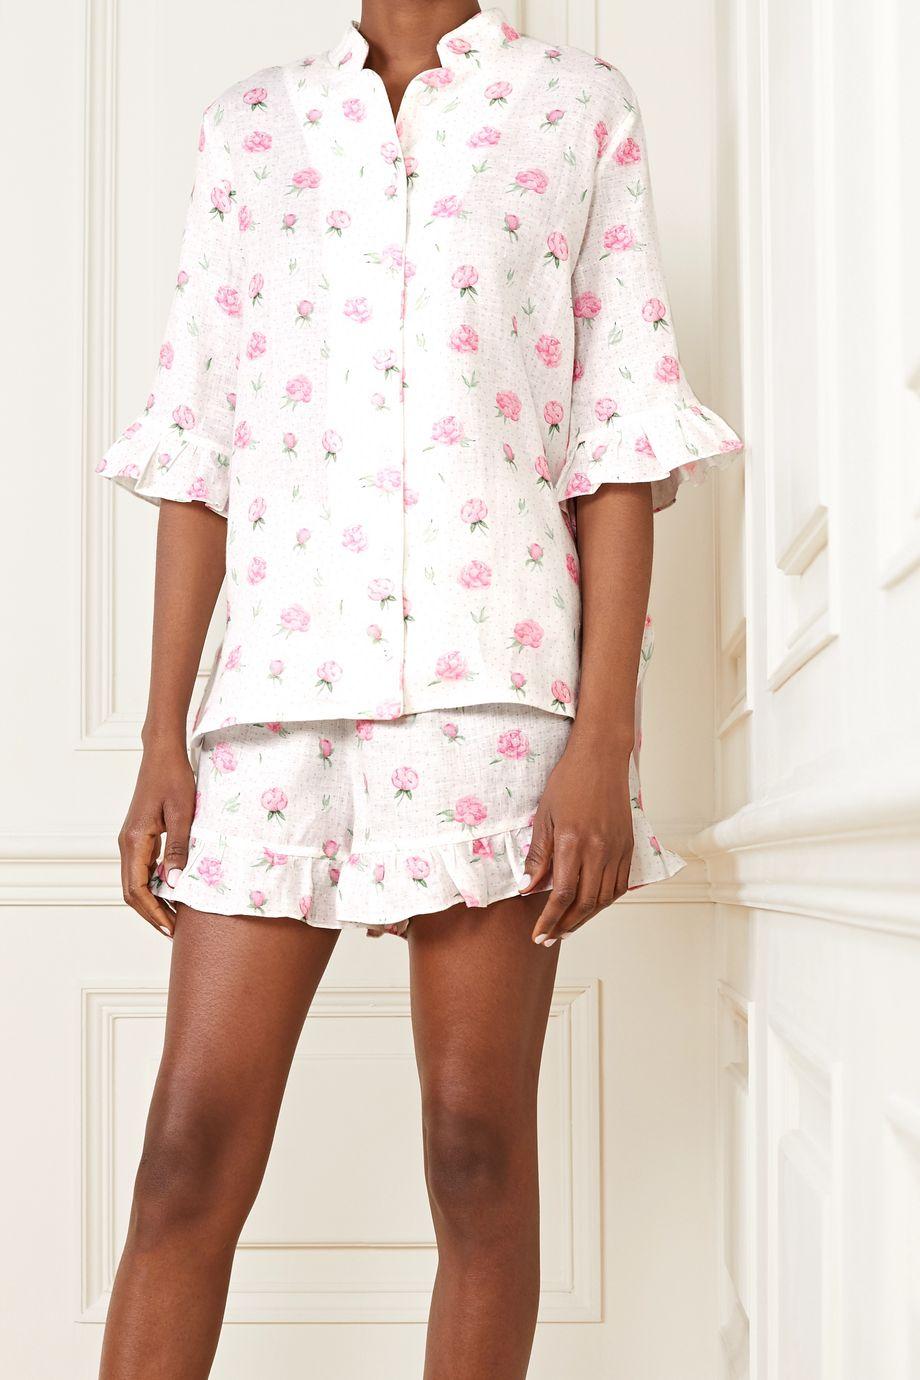 Sleeper Pyjama aus Leinen mit Blumenprint